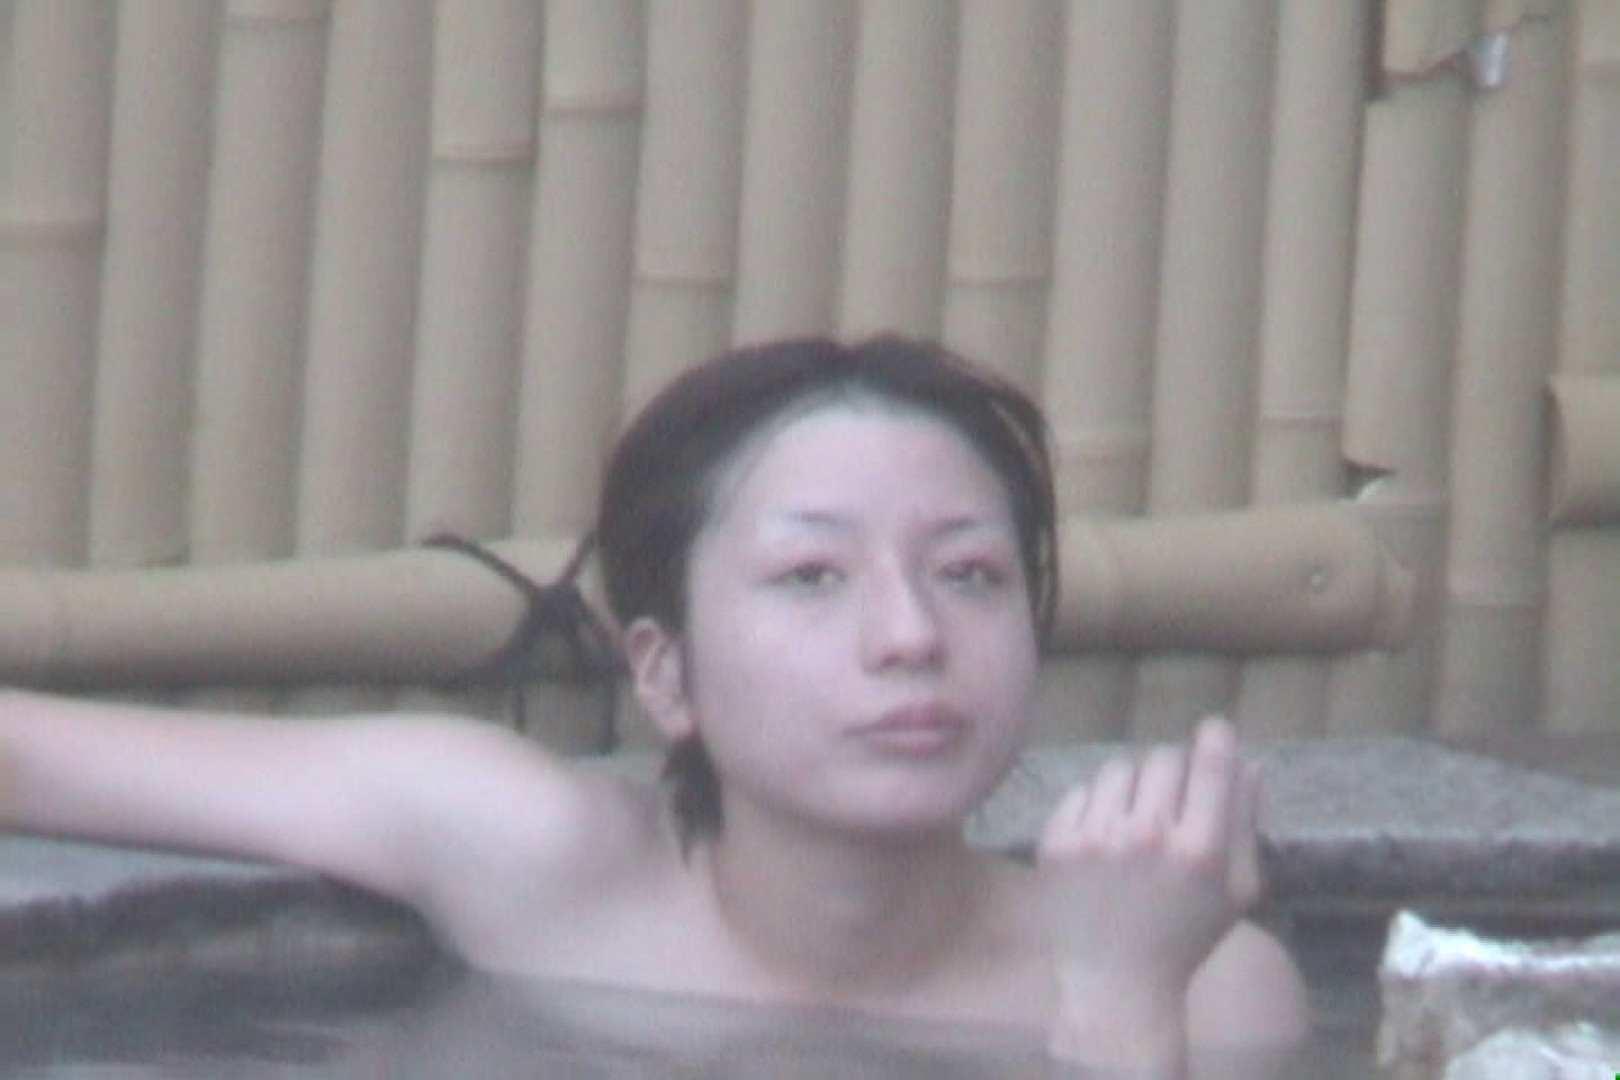 Aquaな露天風呂Vol.608 HなOL | 盗撮  89pic 9